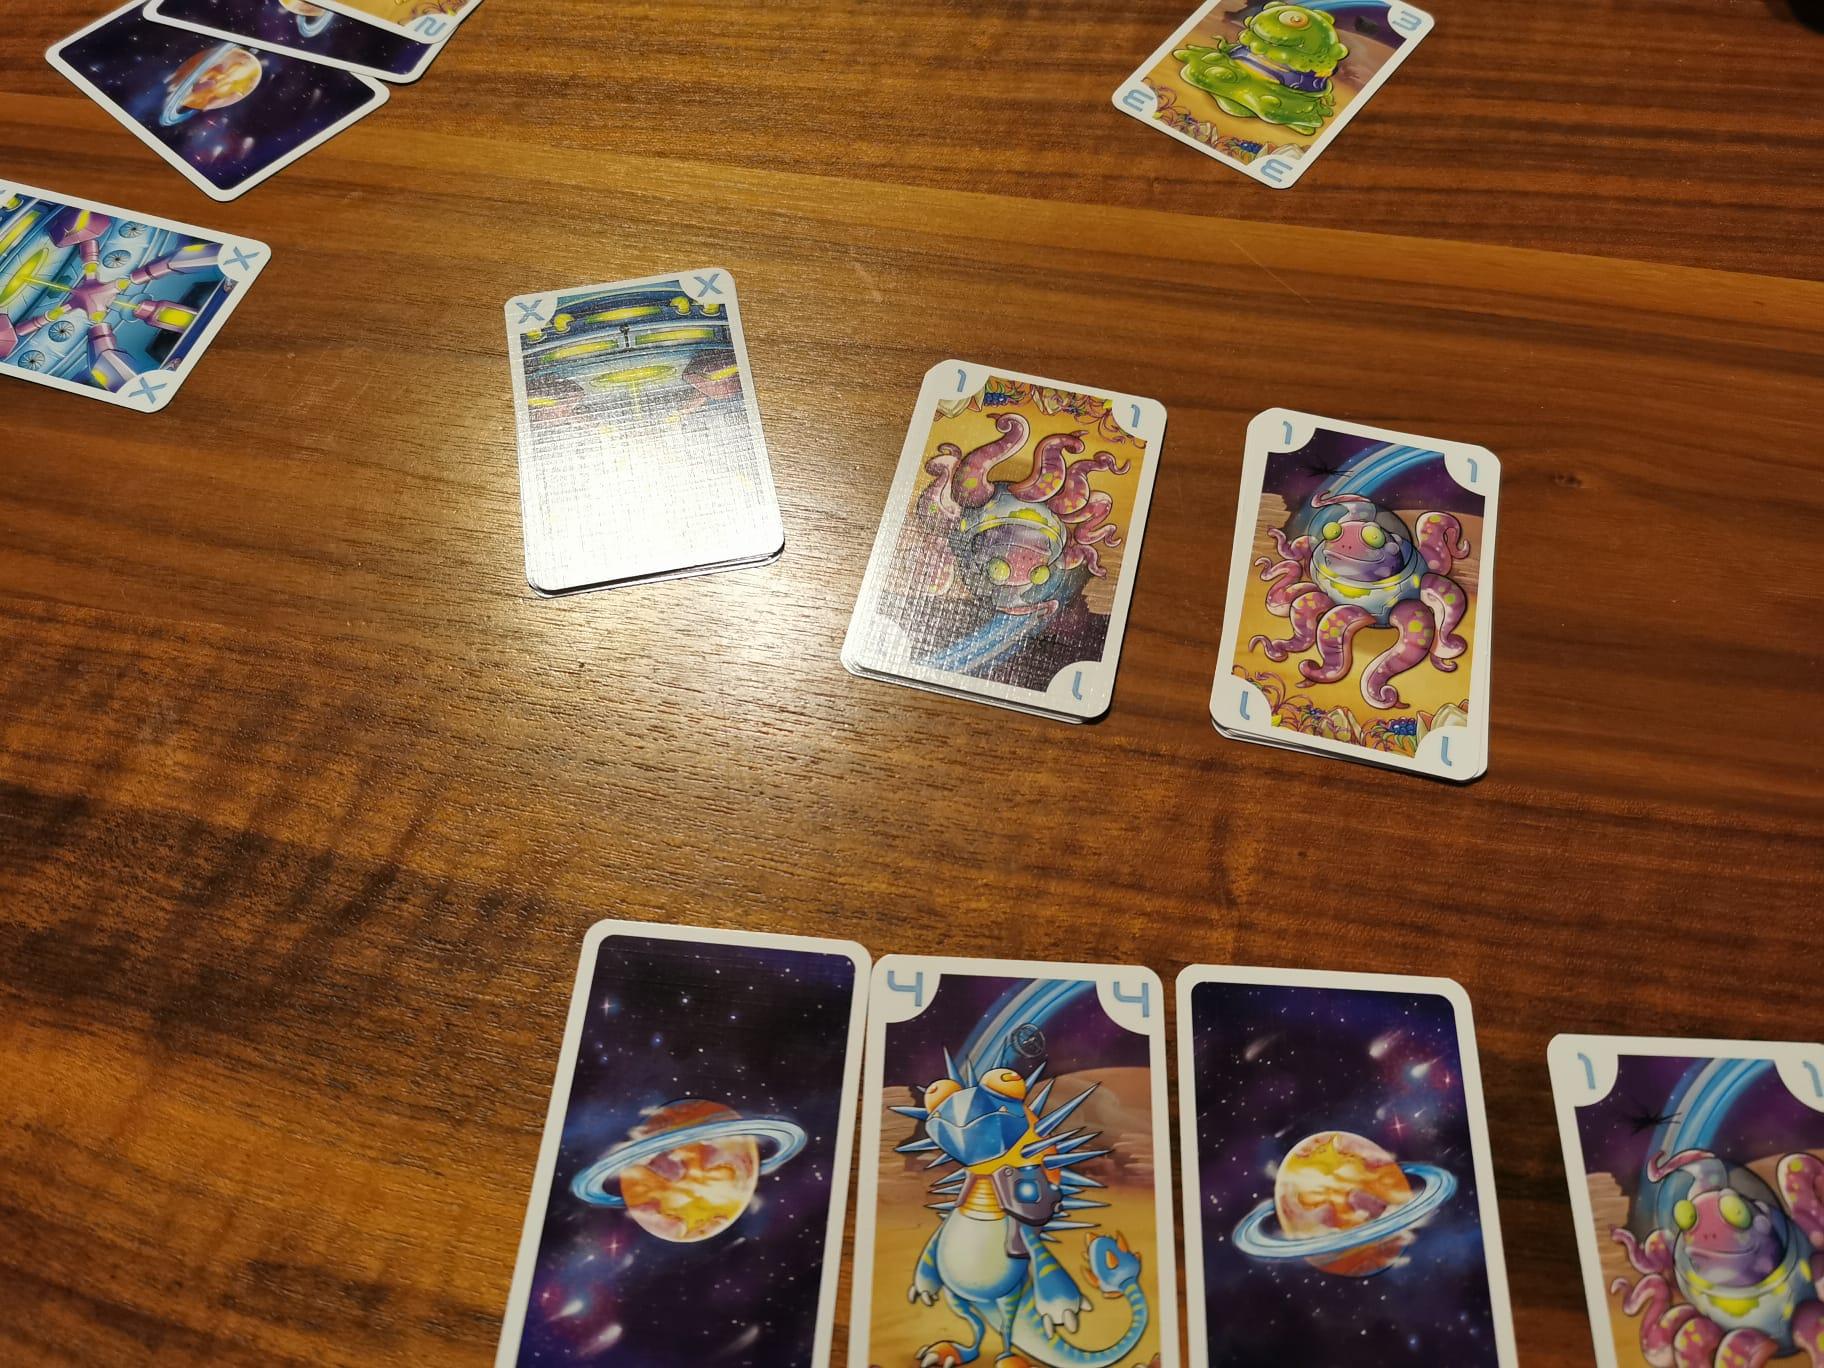 Silent Planet 3 Spieler = 3 Aienteams um zu gewinnen